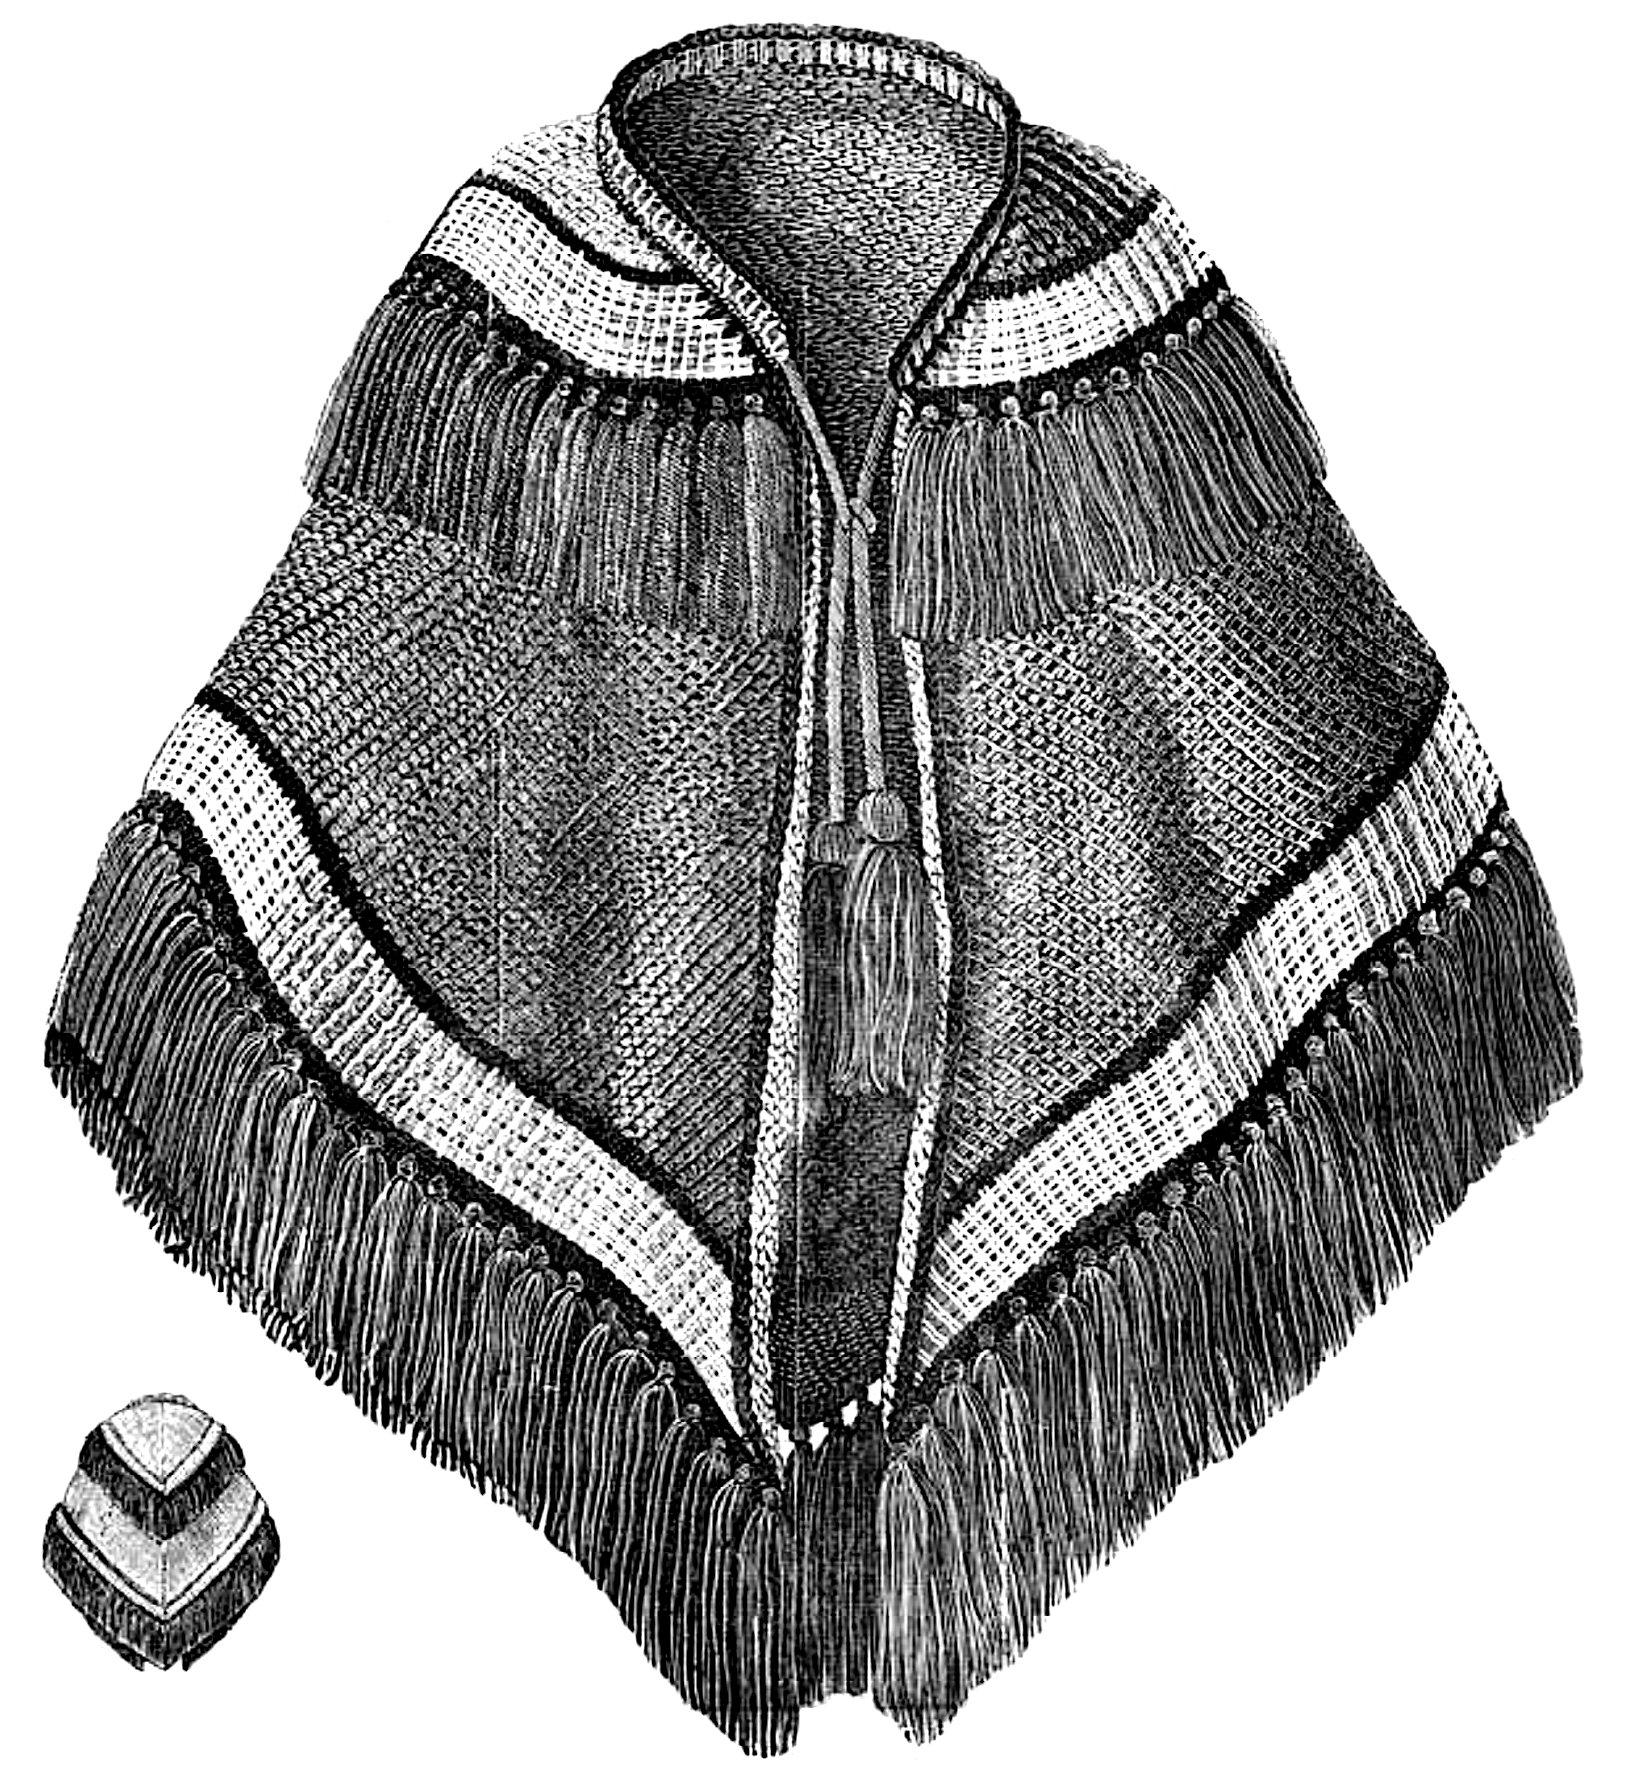 German 1858 cape